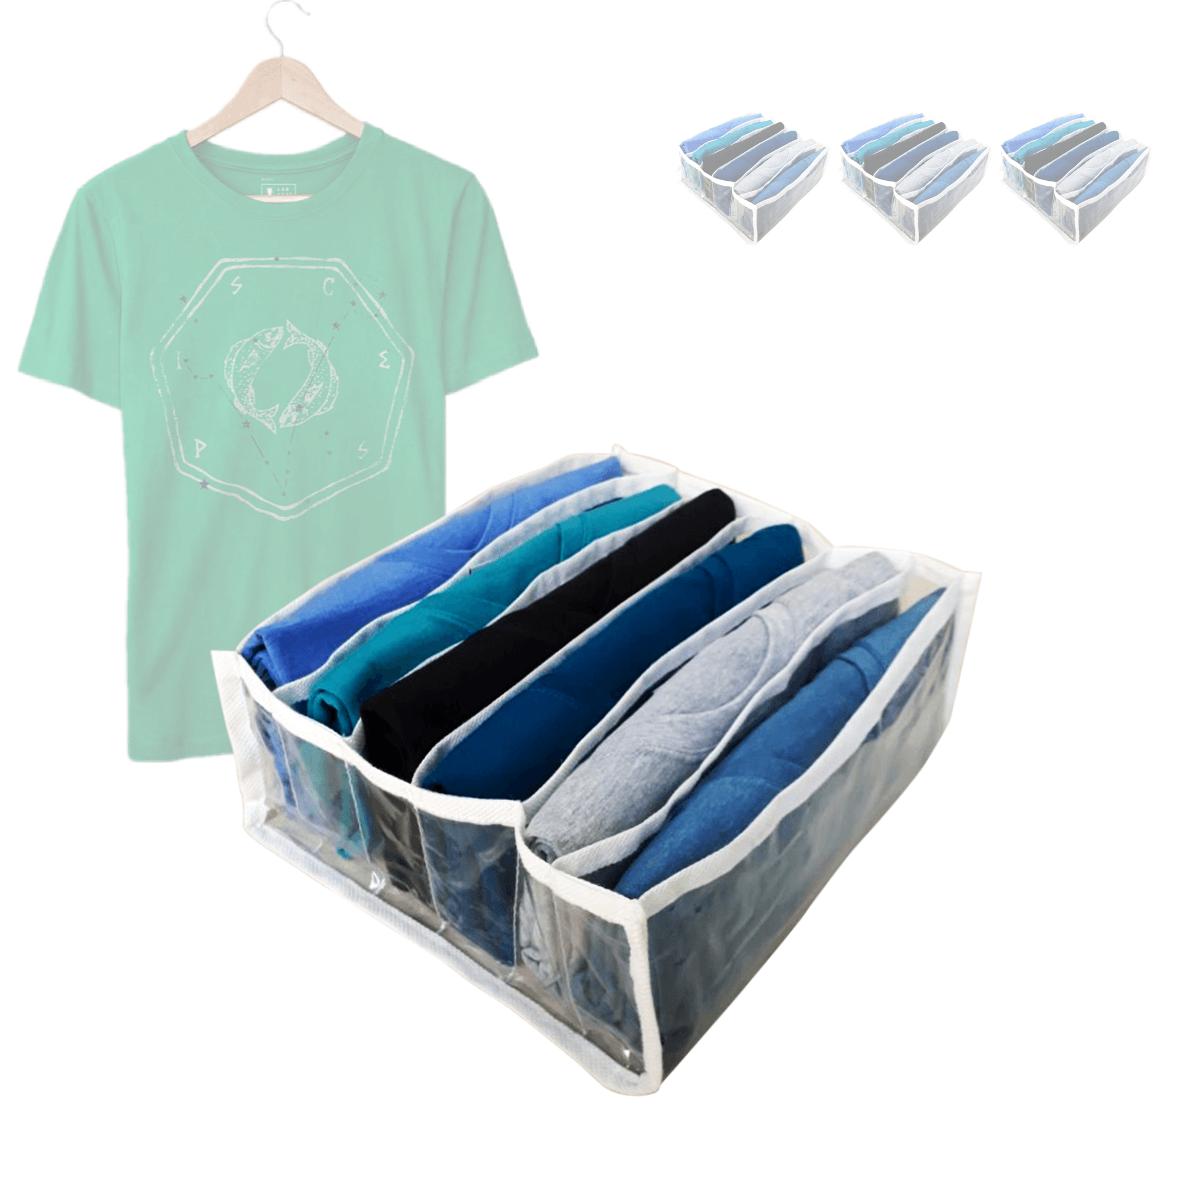 Kit Colmeia Organizadora De Camiseta N2 V.TNT 6 Nichos 32X25X10cm Branco 3Un